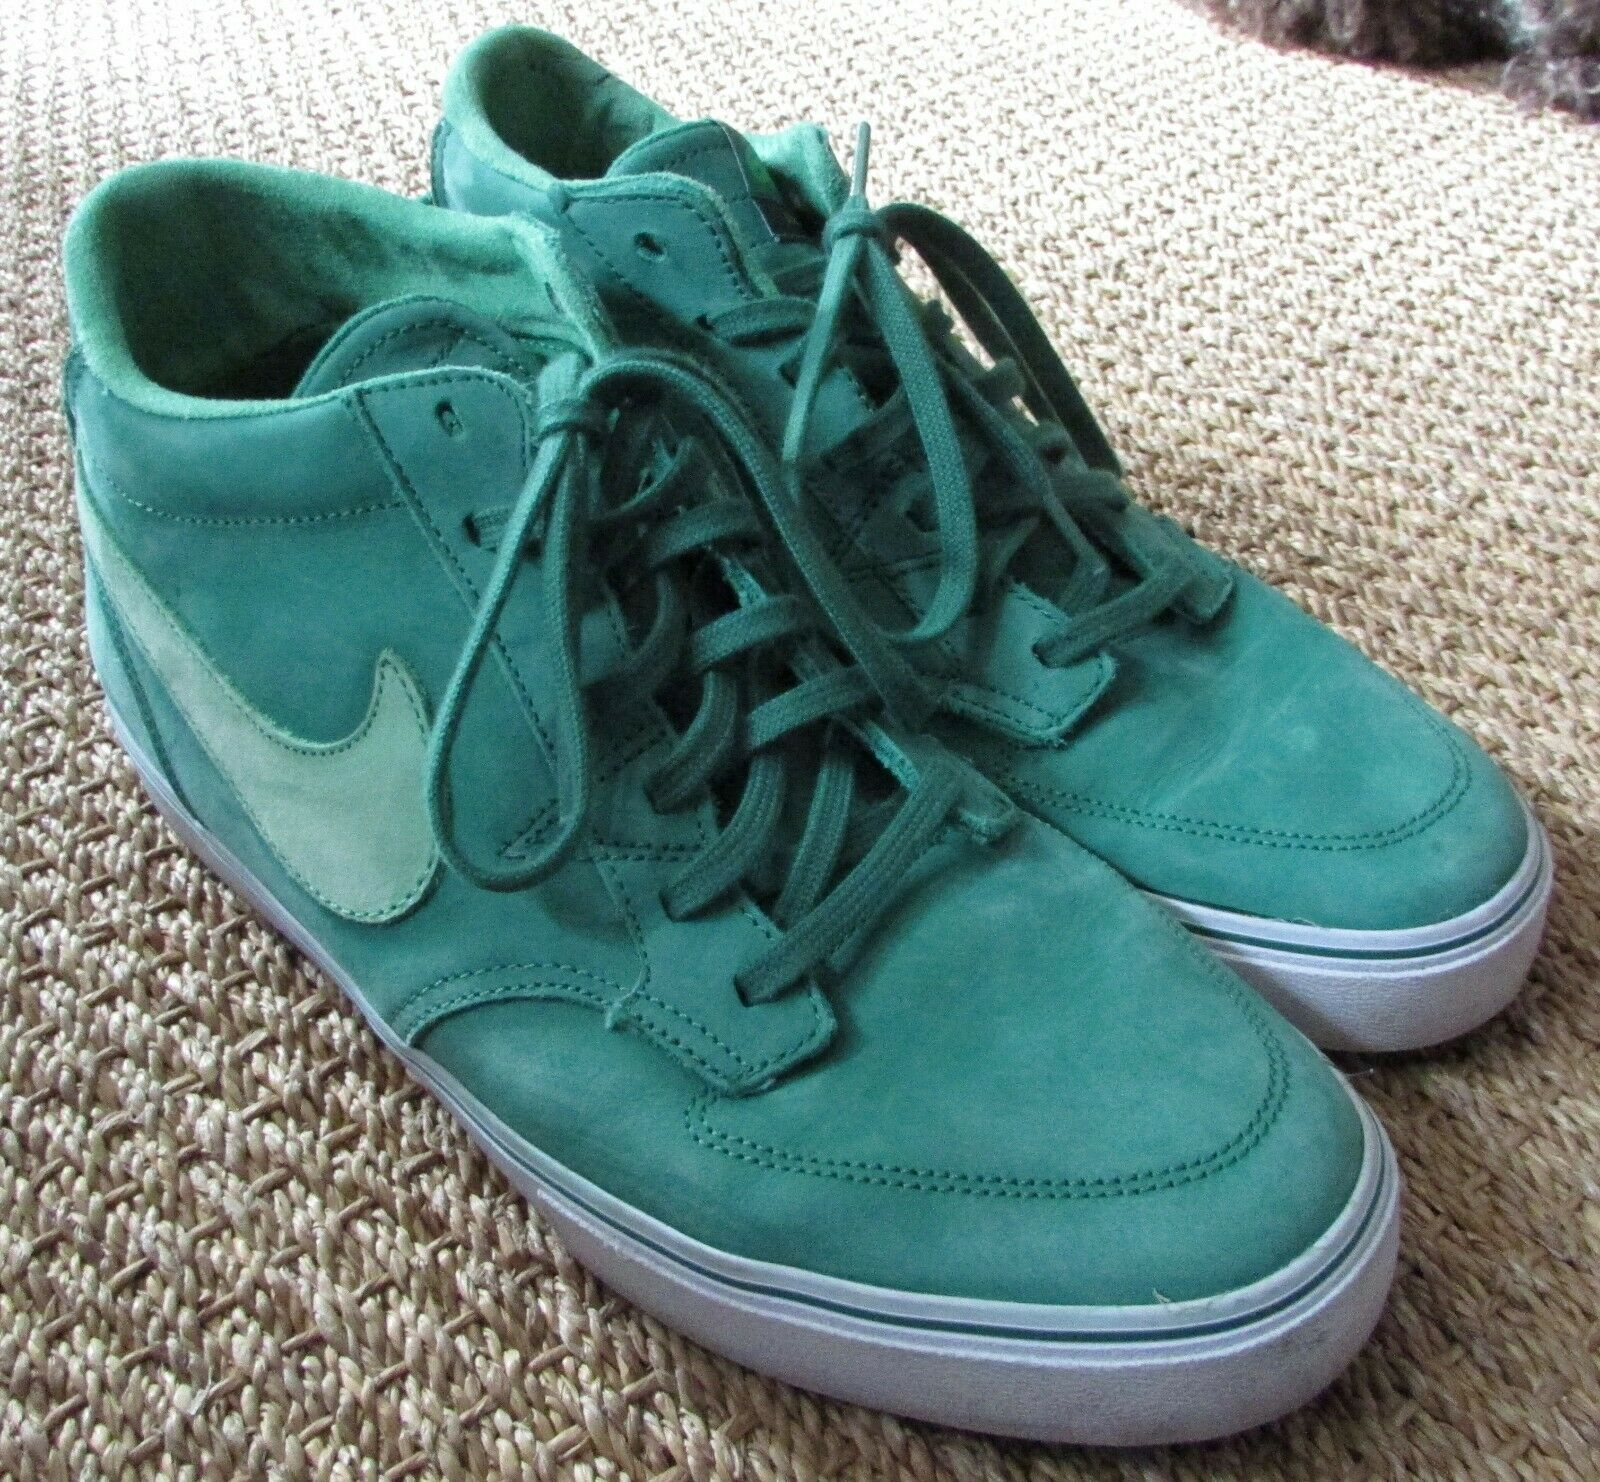 Nike Braata LR Mid Premium verde scarpe da ginnastica 458699  -300 Dimensione 11  popolare